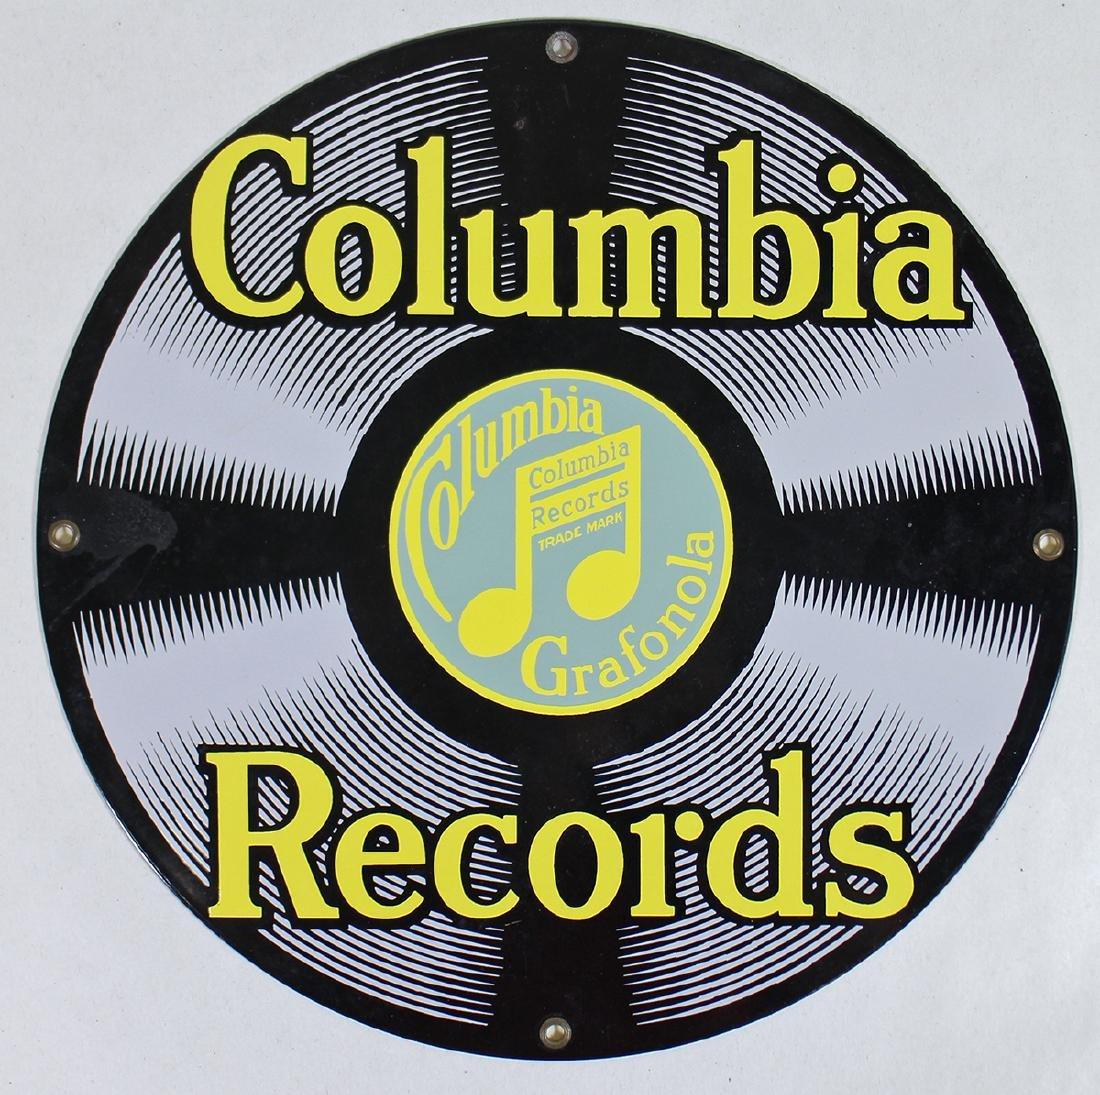 COLUMBIA RECORDS ROUND SIGN